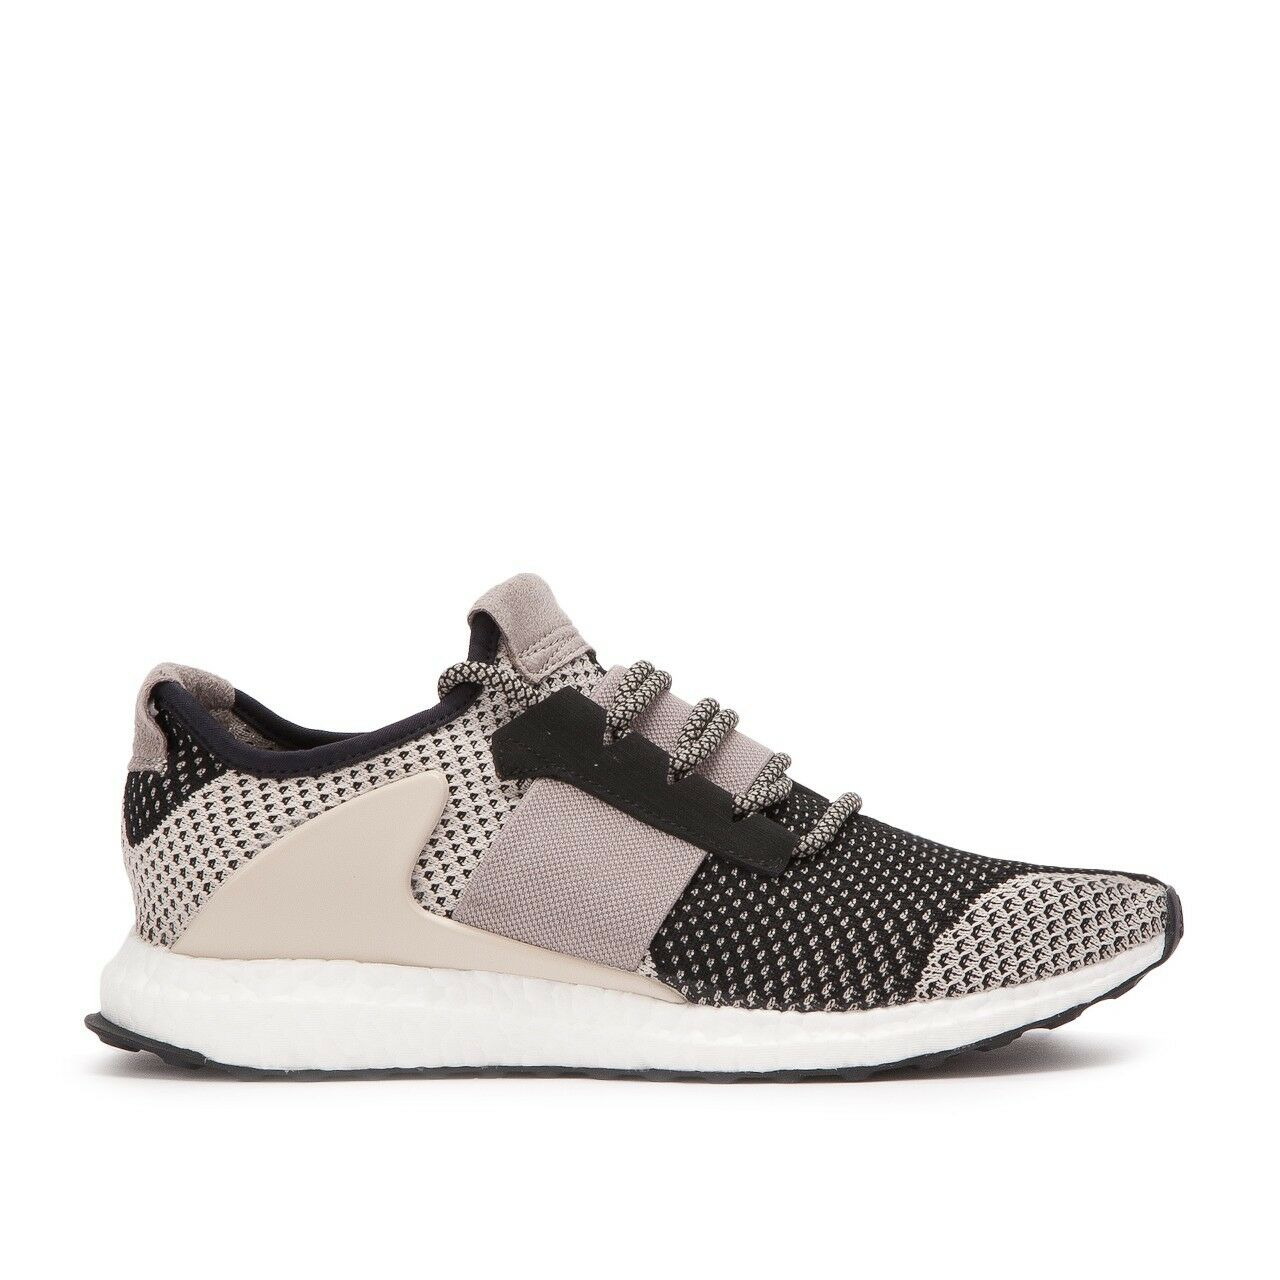 Adidas - schub ado - zg größe 11.cg3735 yeezy nmd - ado pk 2e3eef